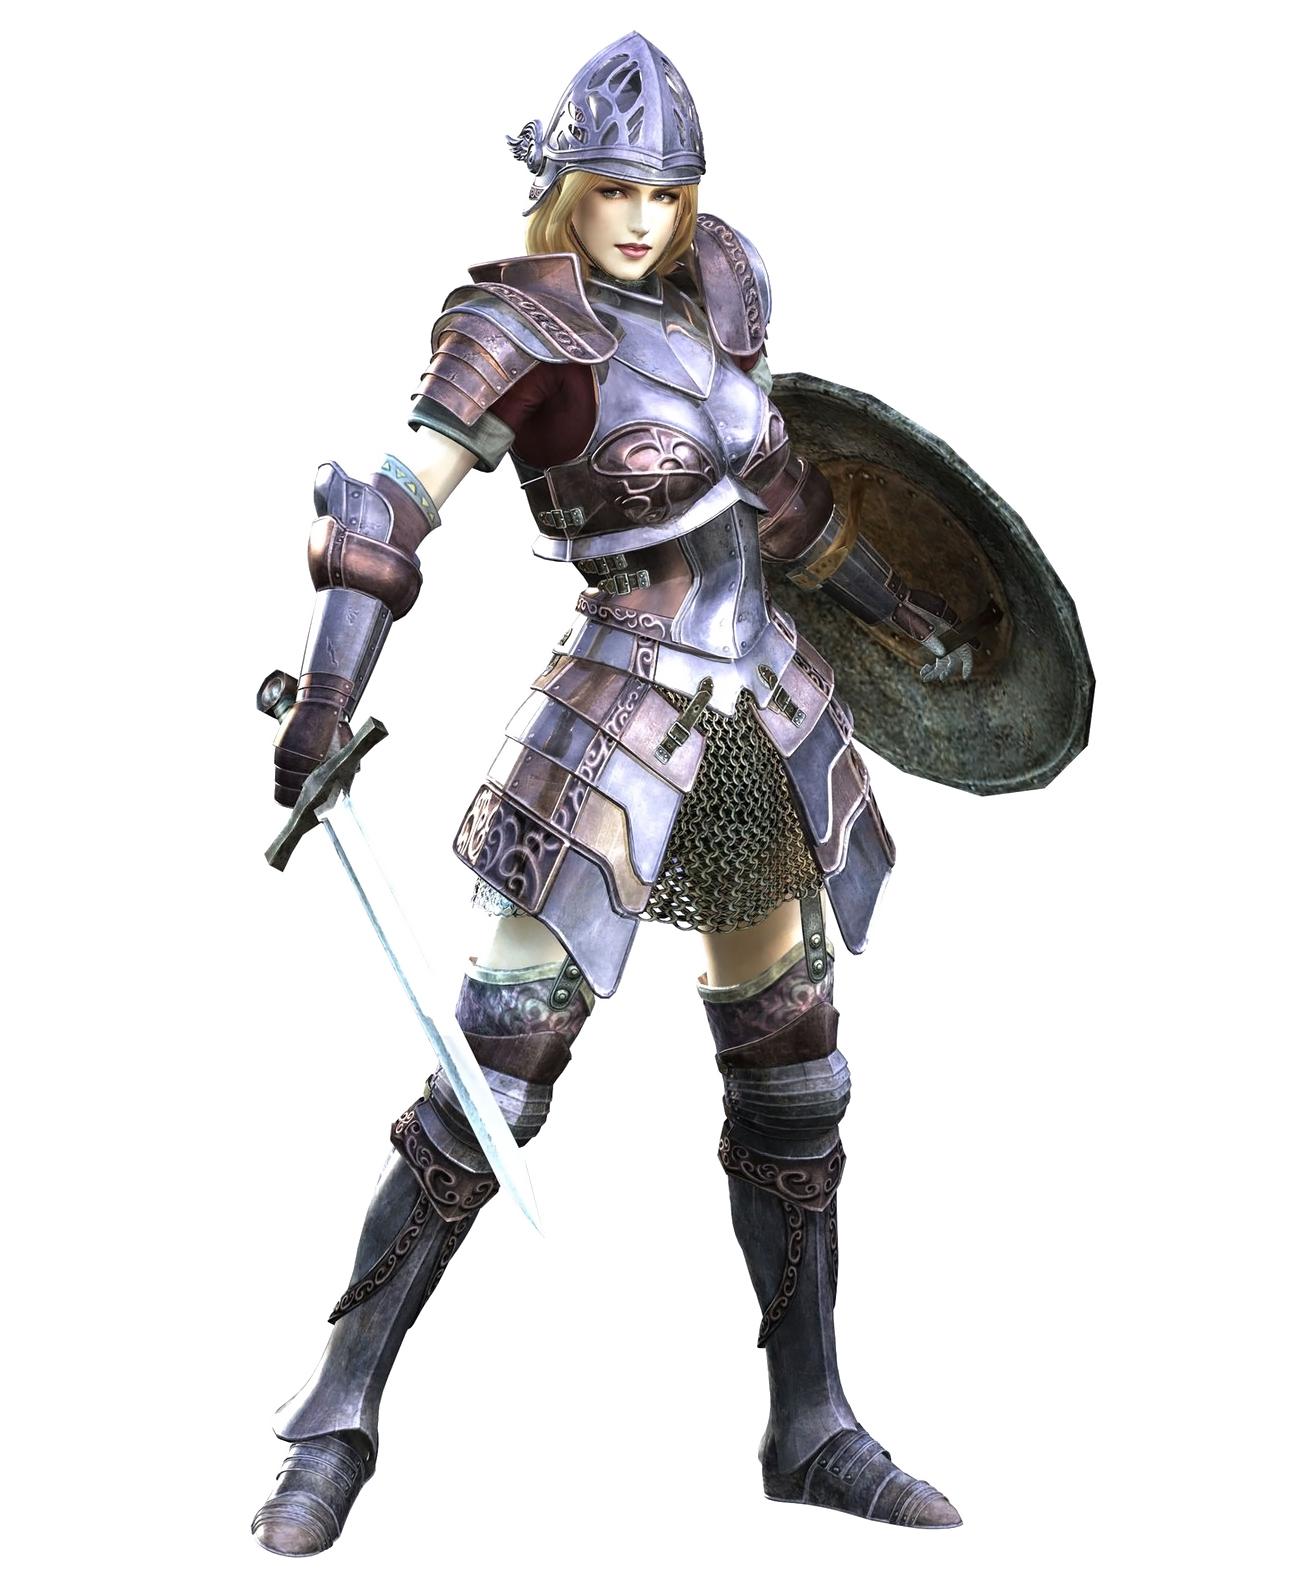 Warriors Orochi 4 All Female Characters: Image - Female Protagonist 1 (BS).jpg